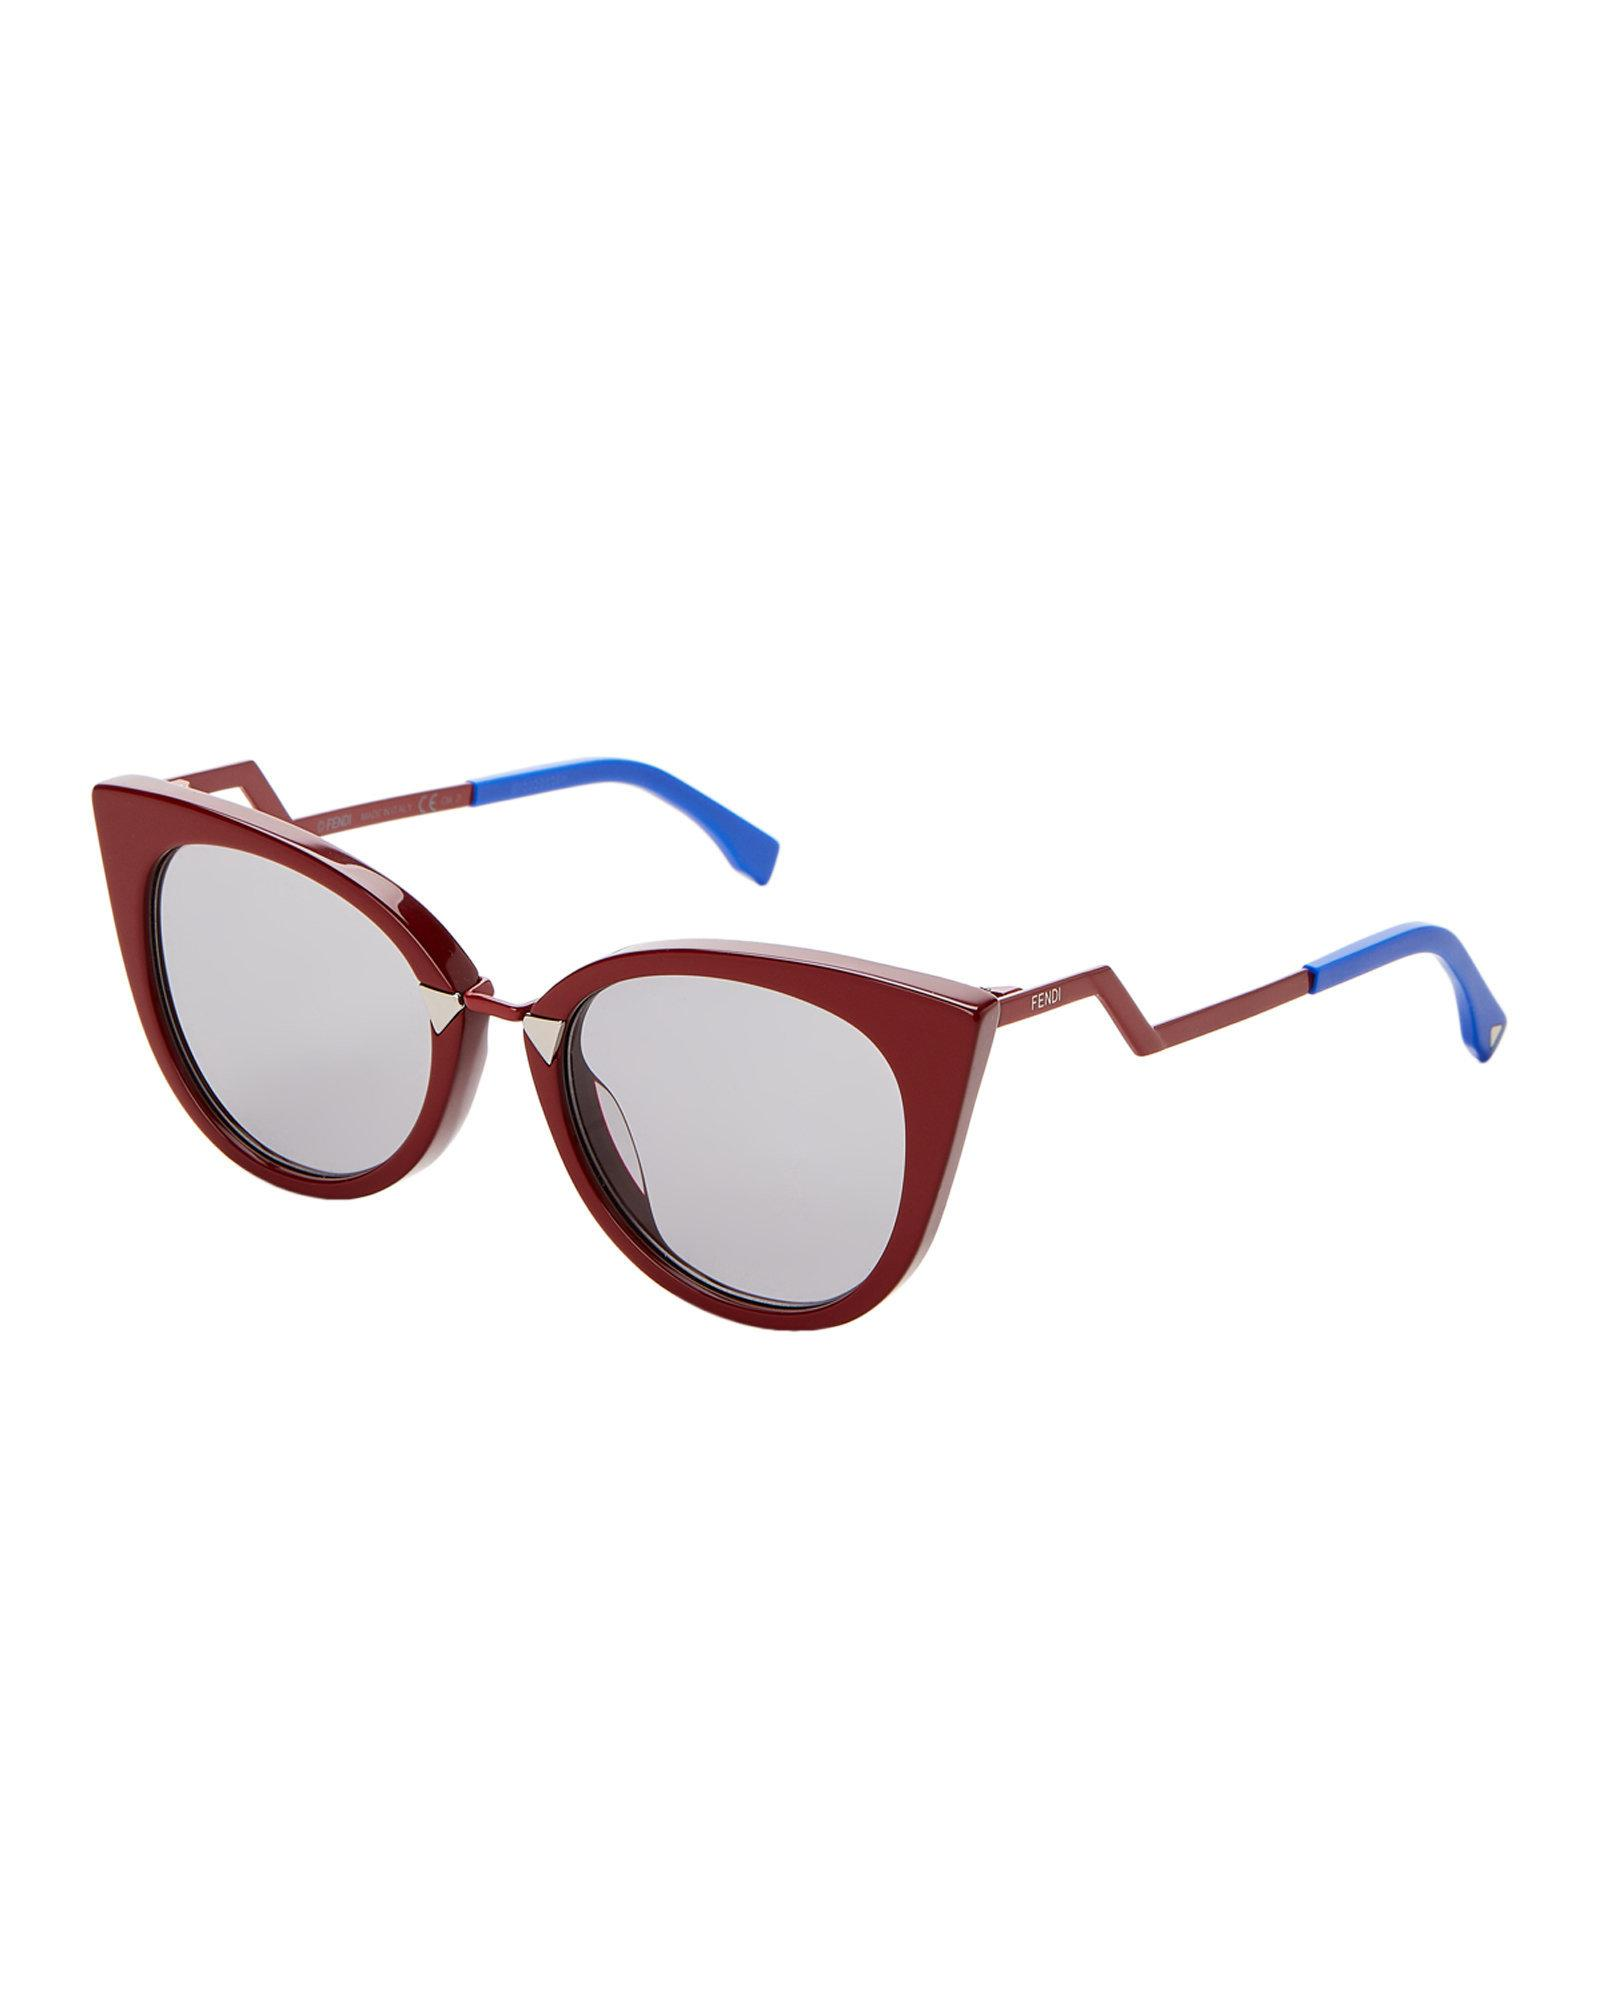 288ba29fd7ba Source · Lyst Fendi Ff 0118 s Red Cat Eye Sunglasses in Red